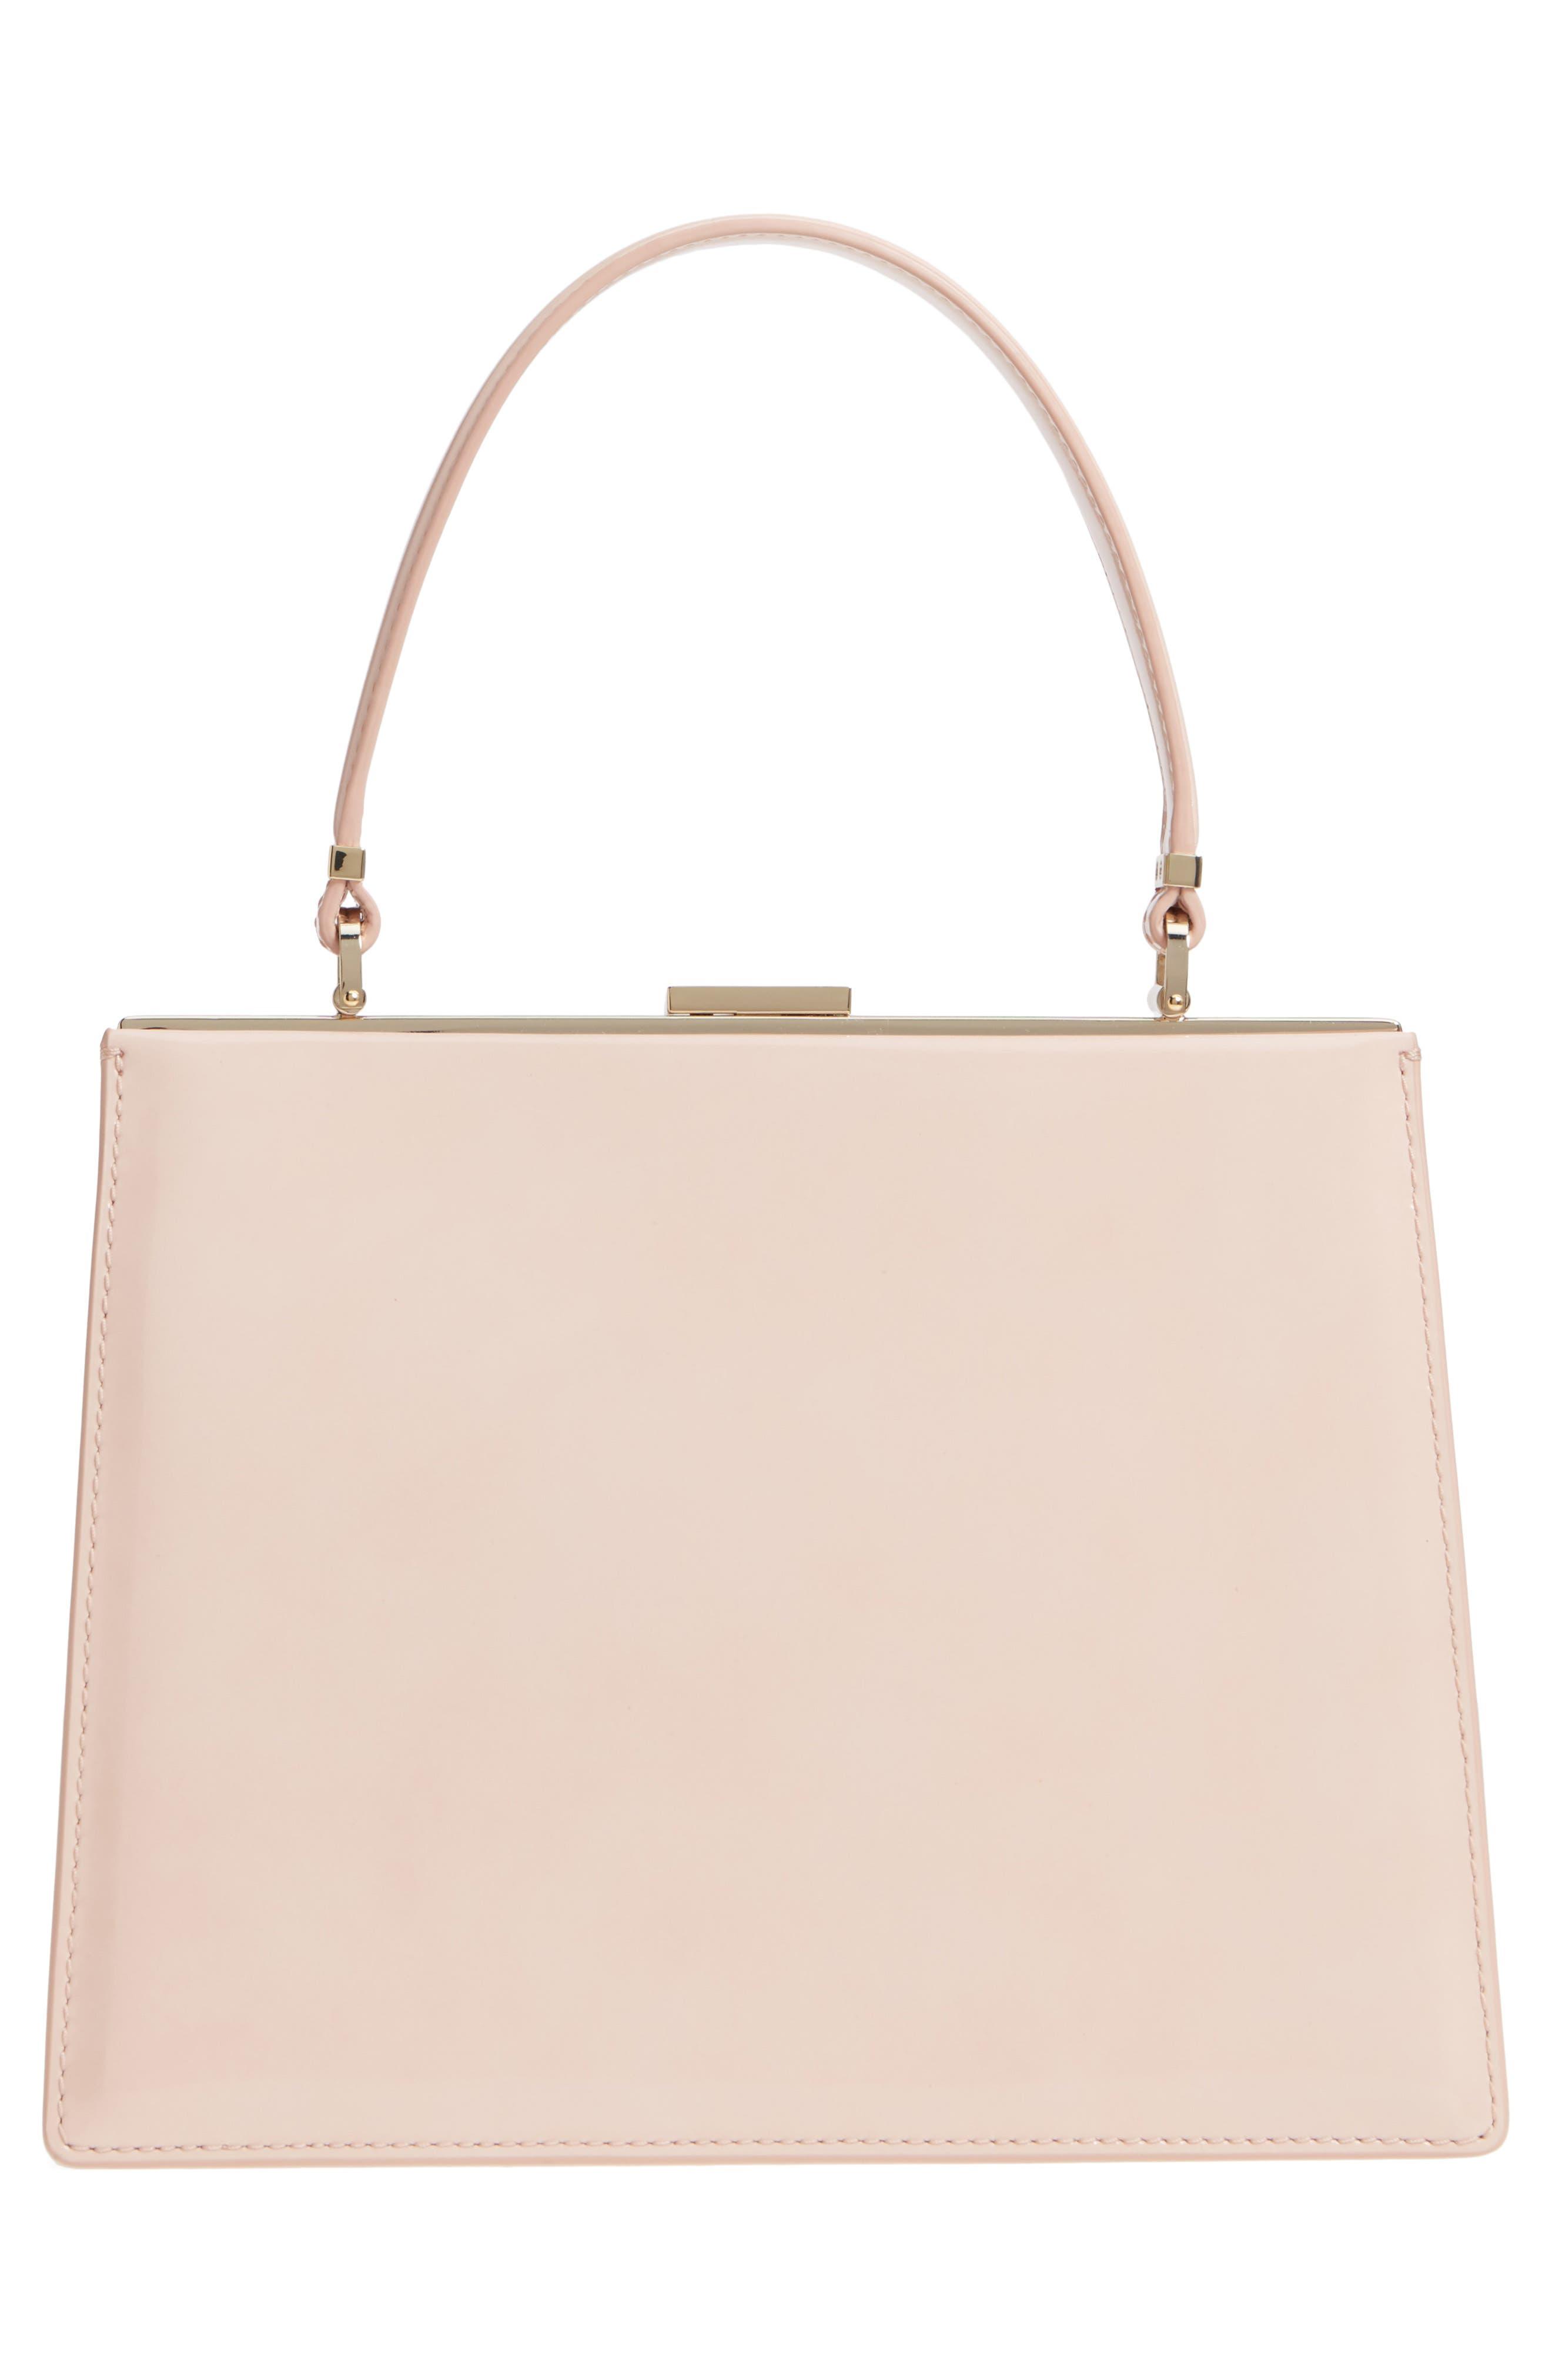 madison moore road - chari leather handbag,                             Alternate thumbnail 6, color,